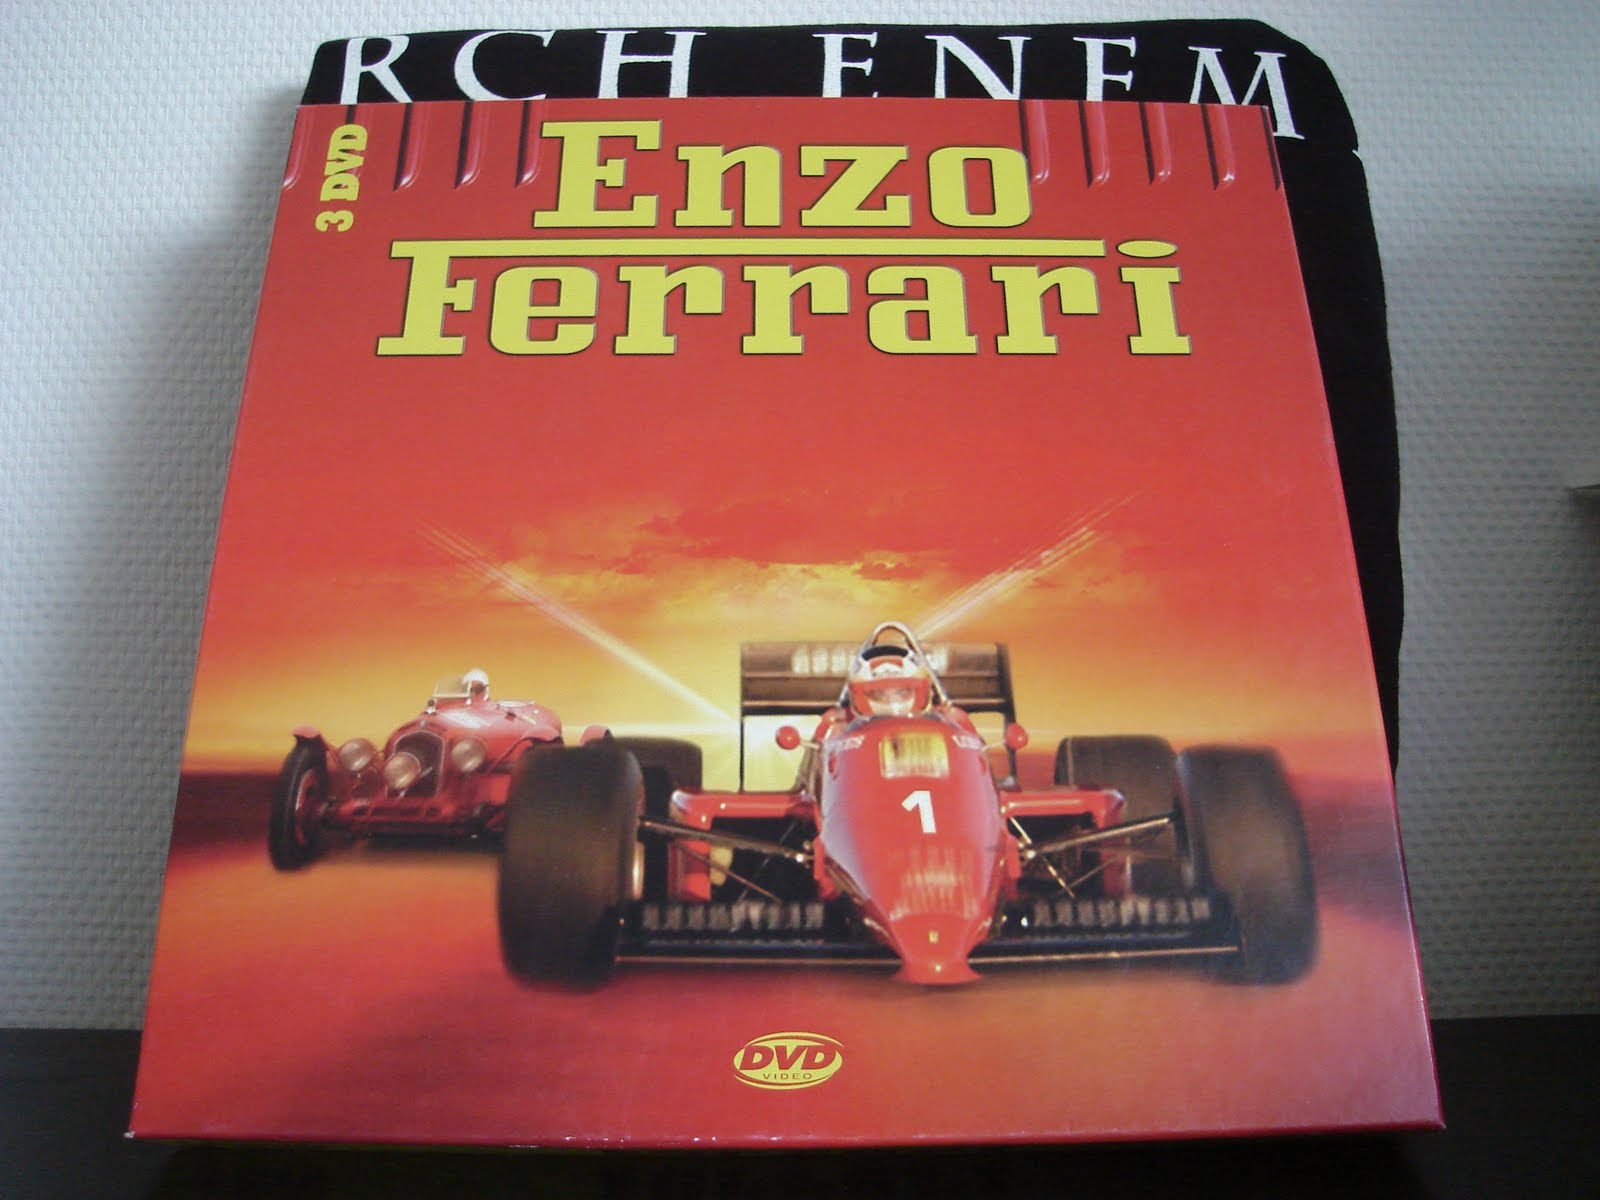 renavspainatal - dvd collection: enzo ferrari - the movie